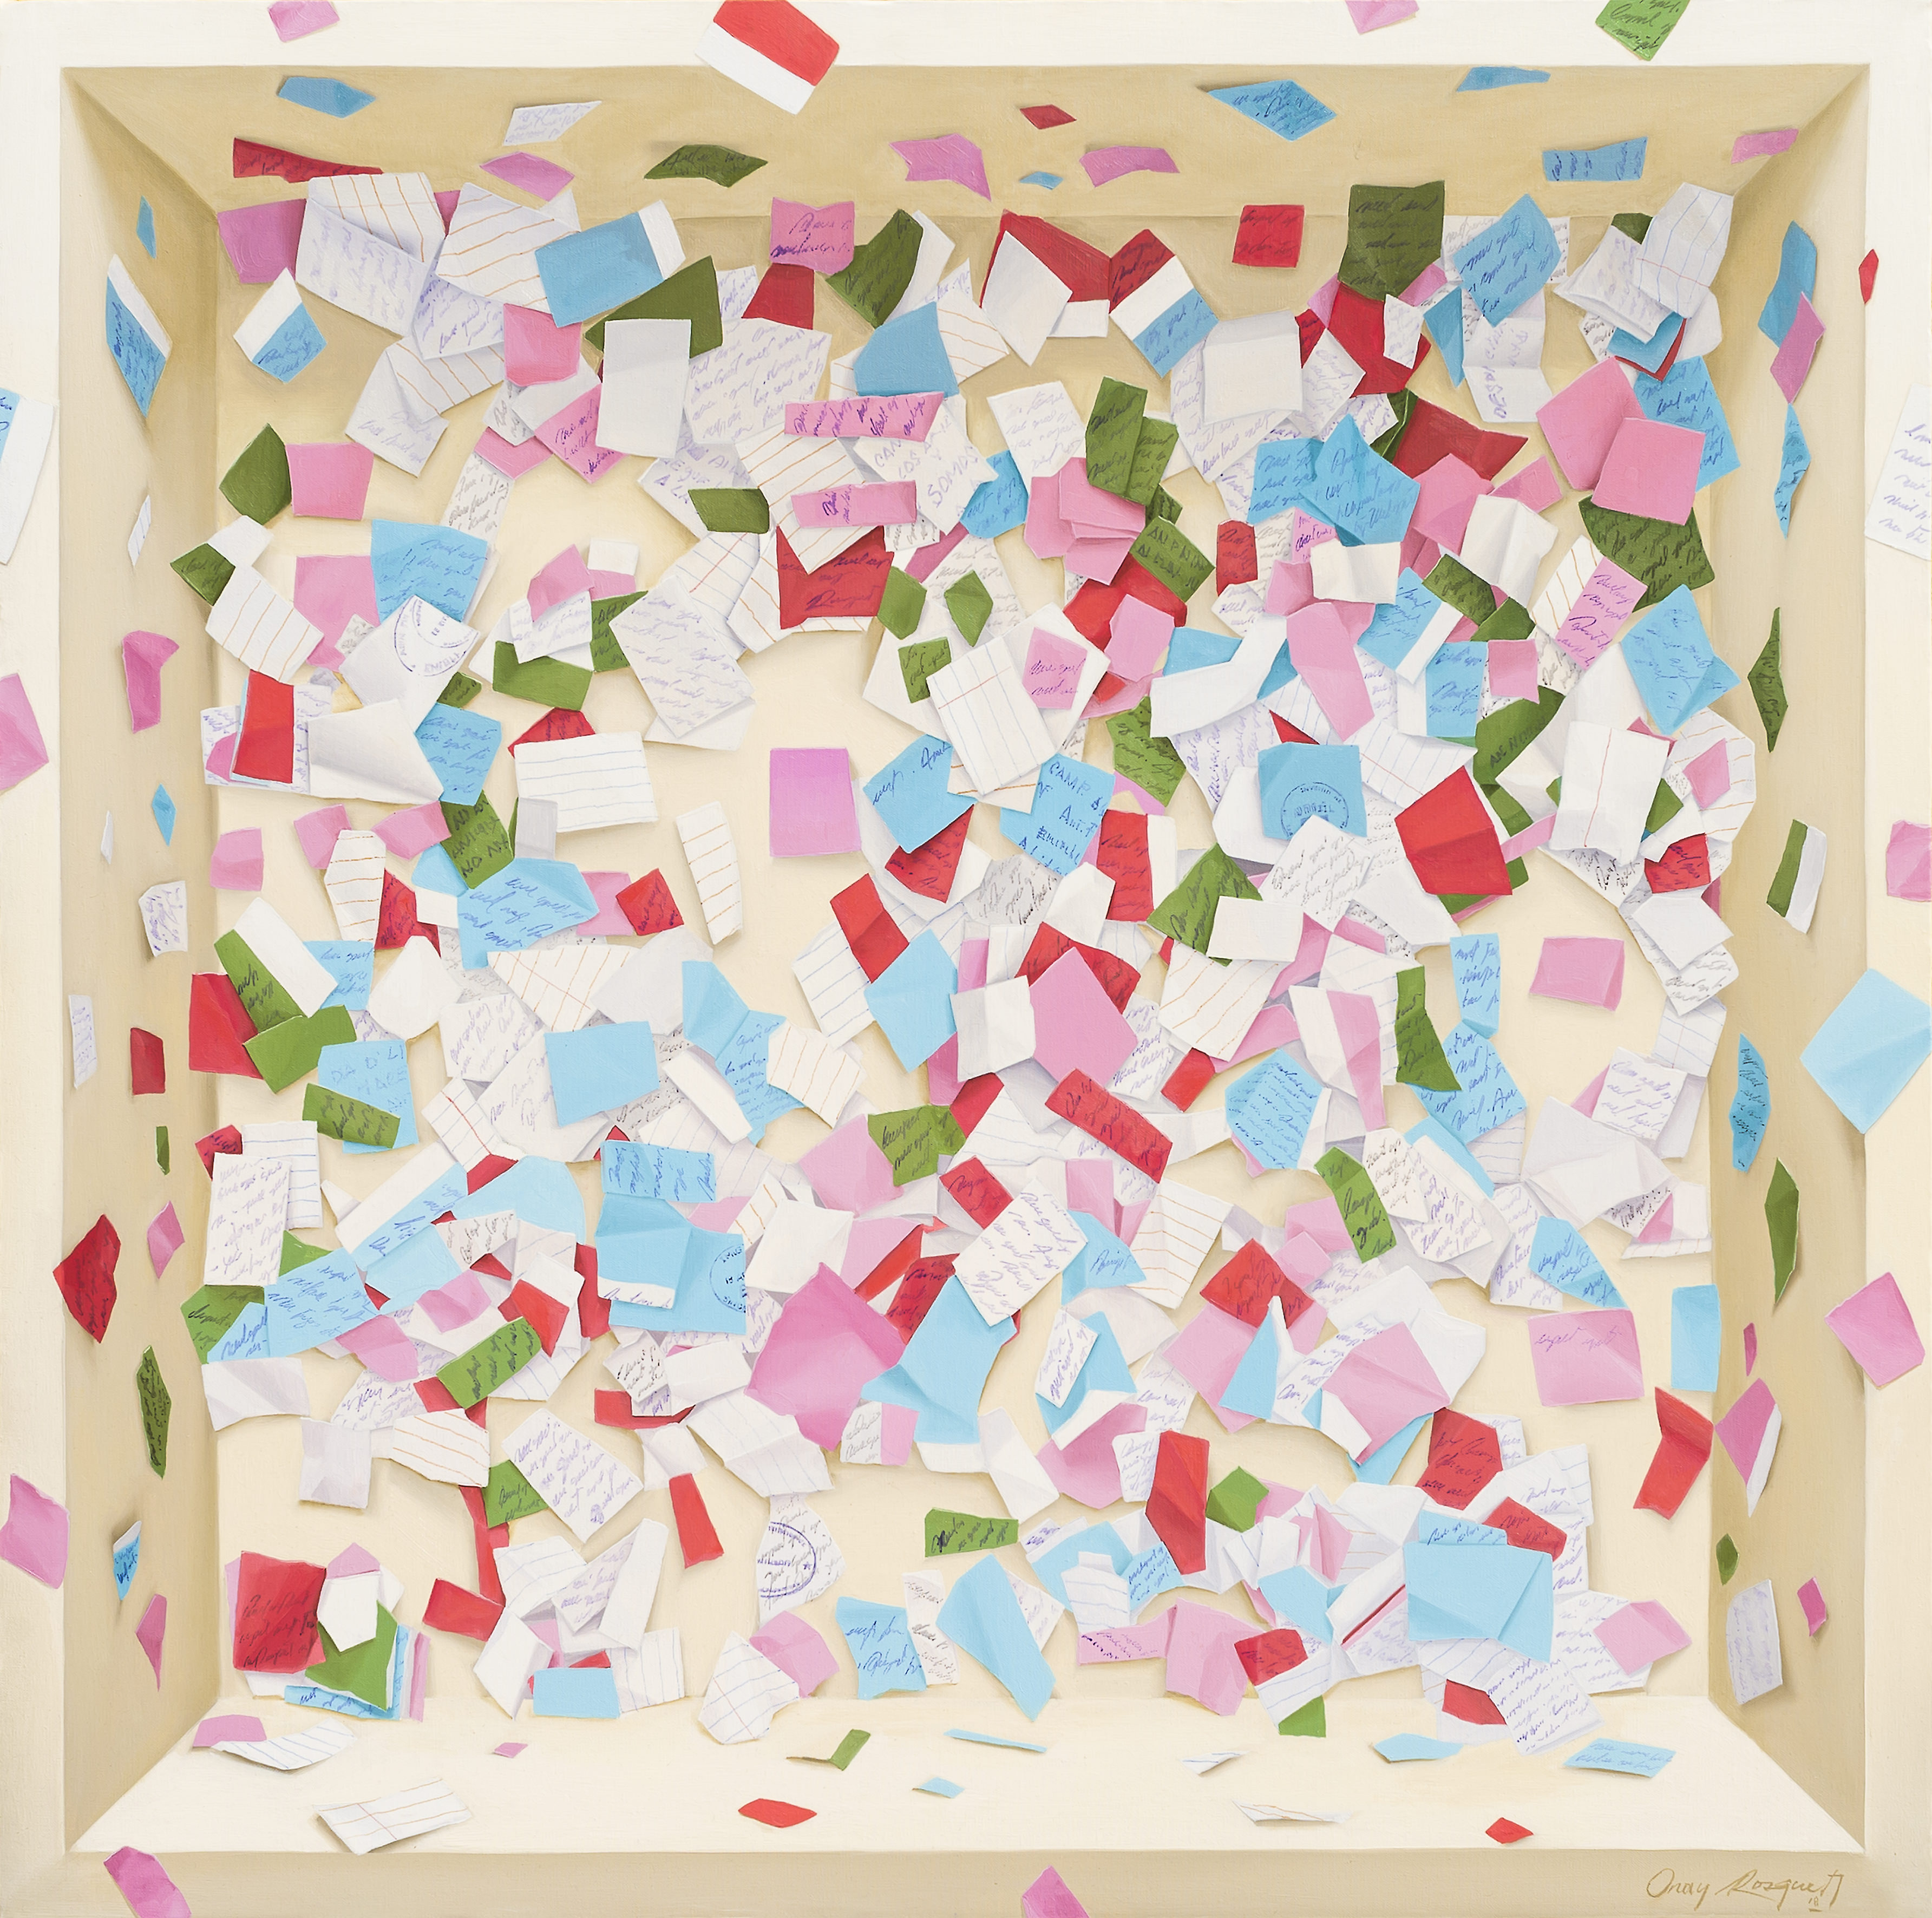 Onay Rosquet - Confetti, 2018, Oil on canvas, 100 x 100 cm